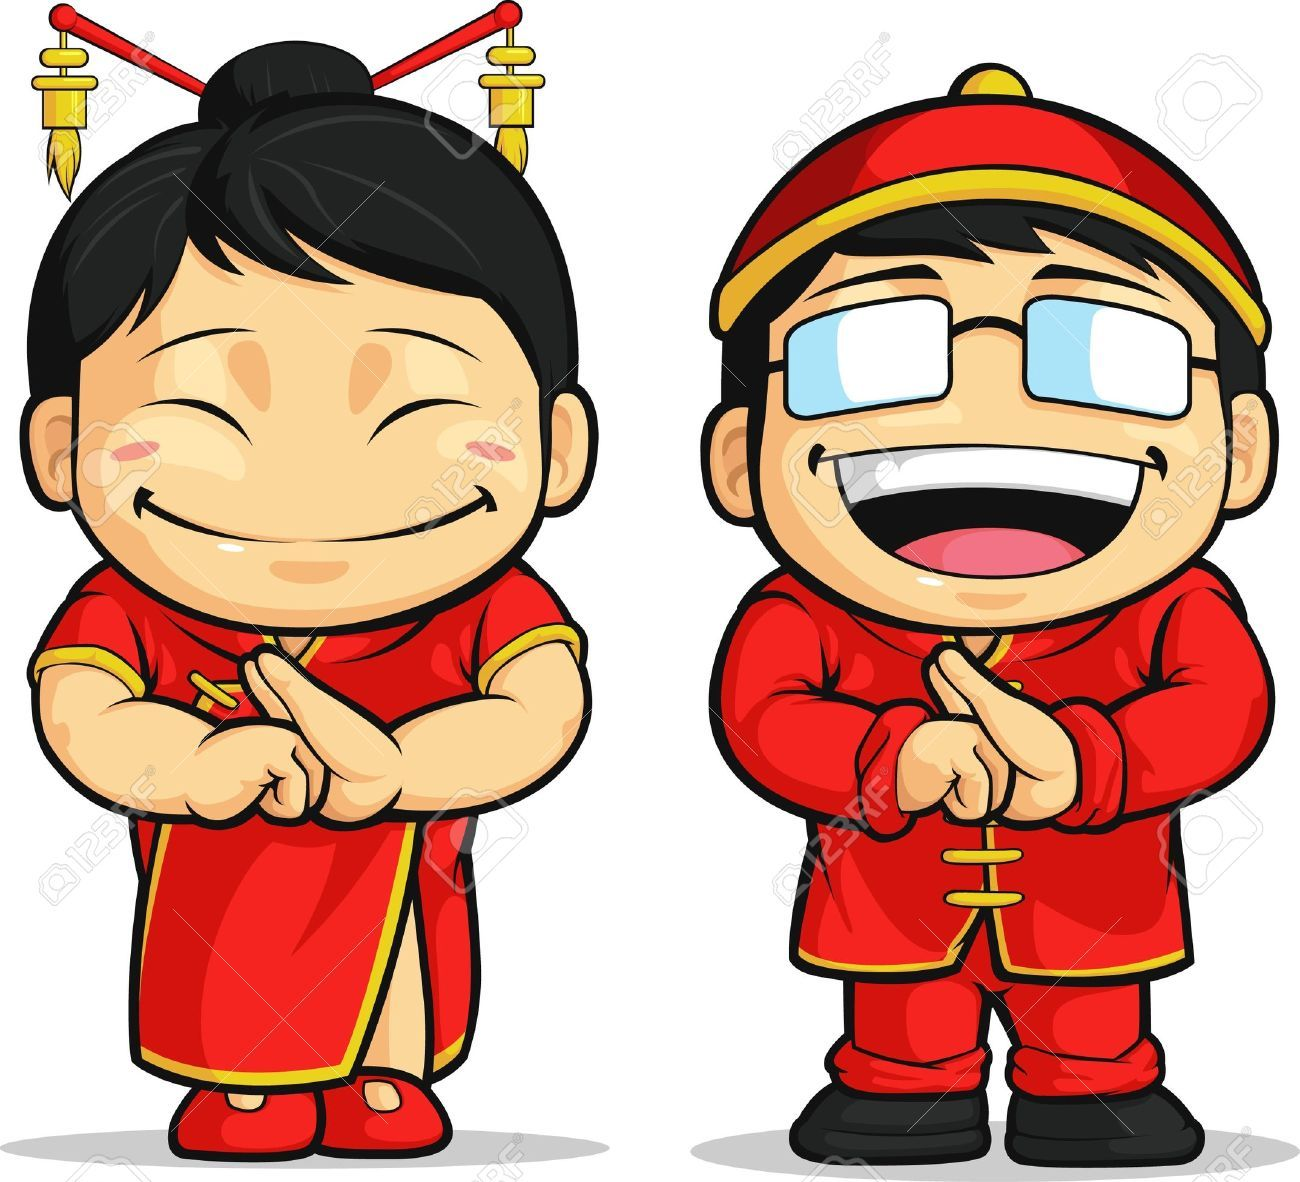 Asian clipart happy. Cartoon of chinese boy